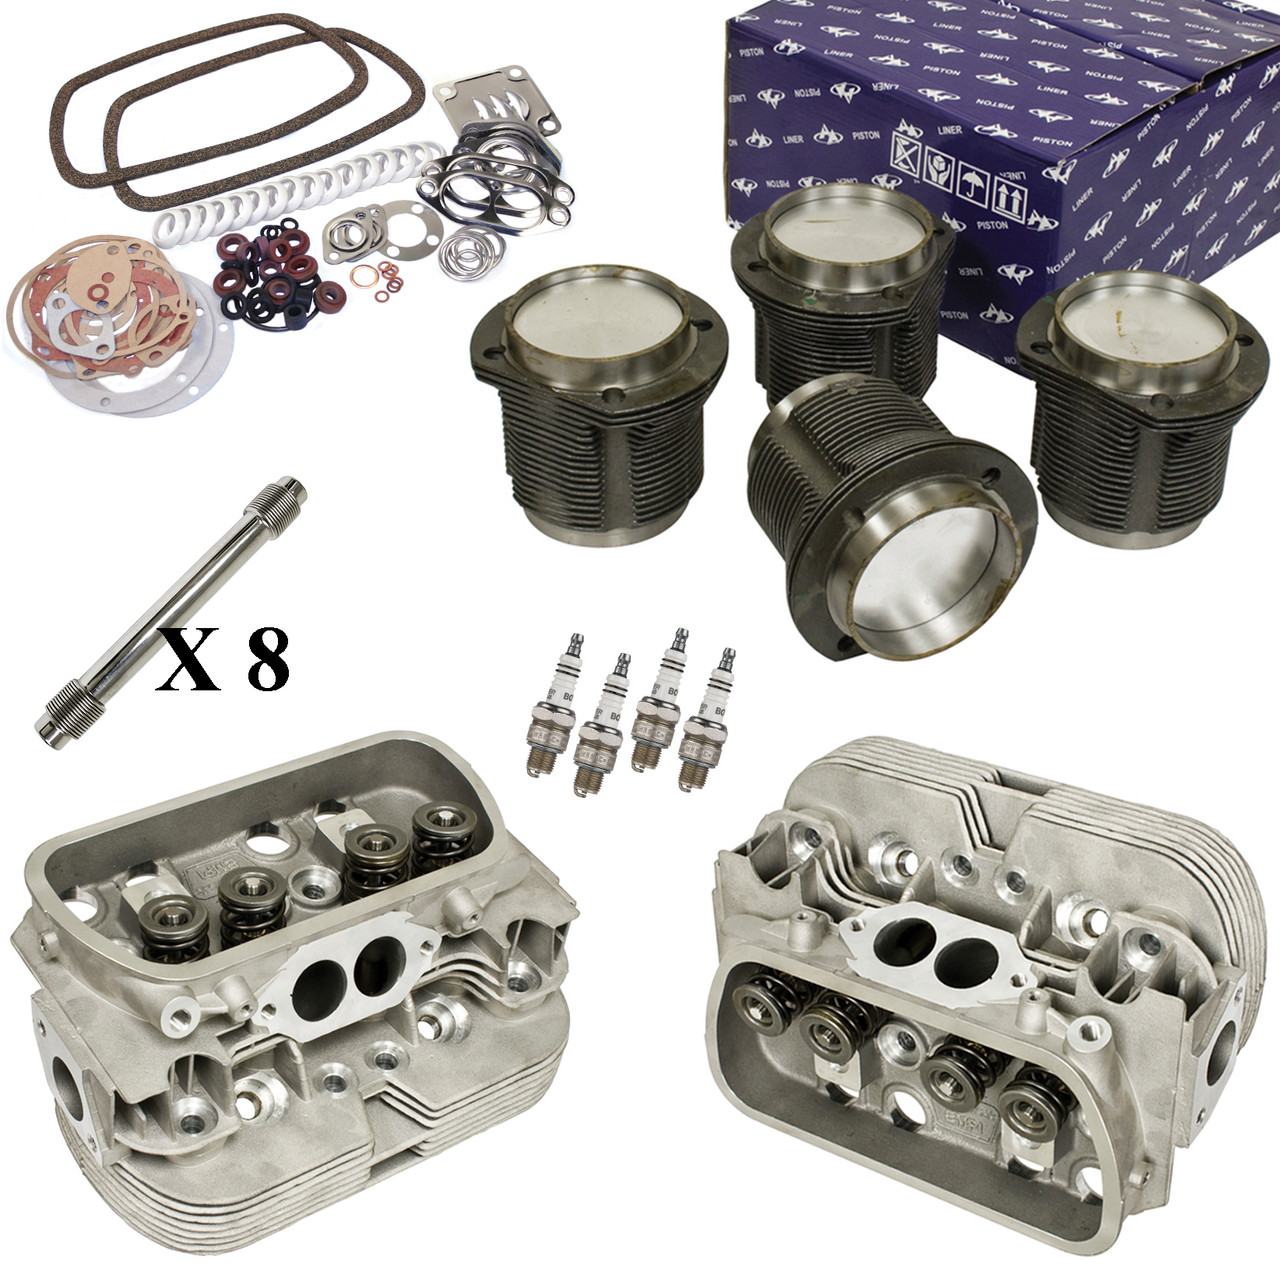 Vw Engine Rebuild Kit Top End Heads Pistons Moore Parts